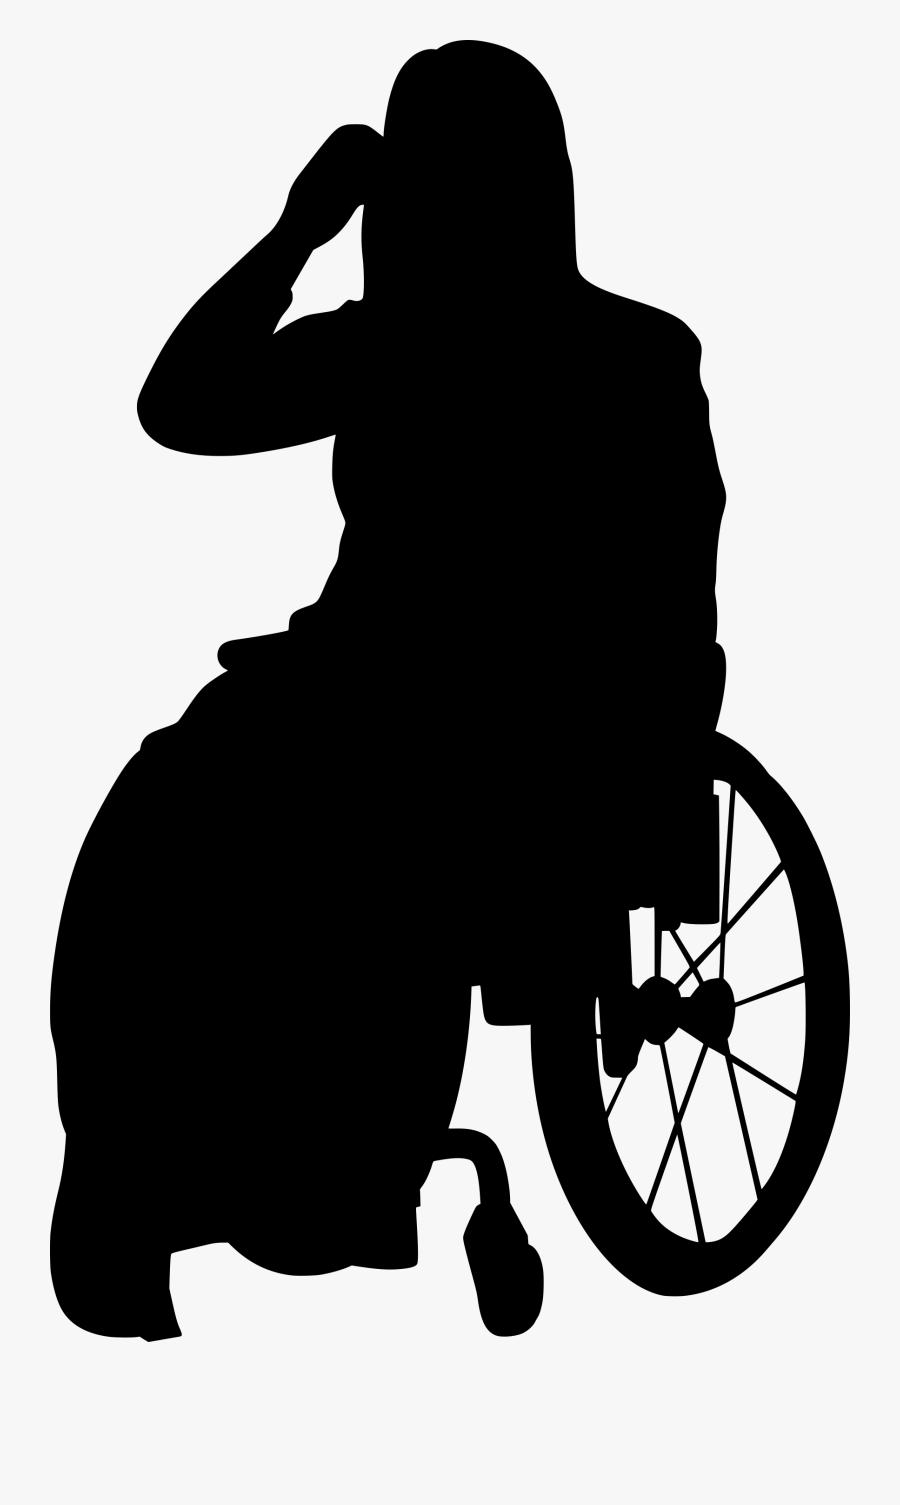 Handicap Disabled Transparent - Silhouette Person In Wheelchair, Transparent Clipart